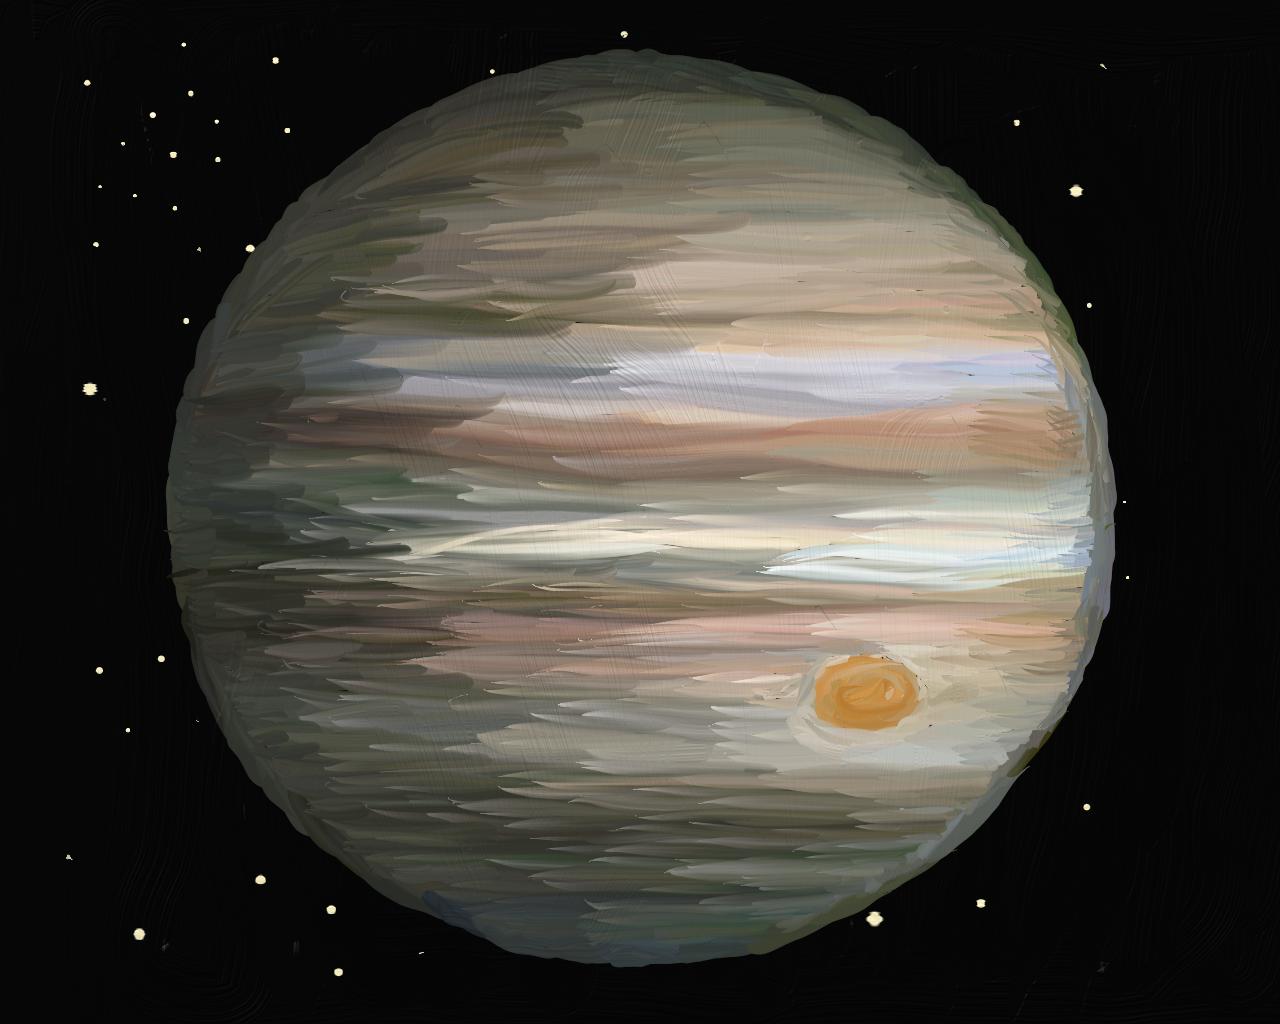 Jupiter, an oil painting